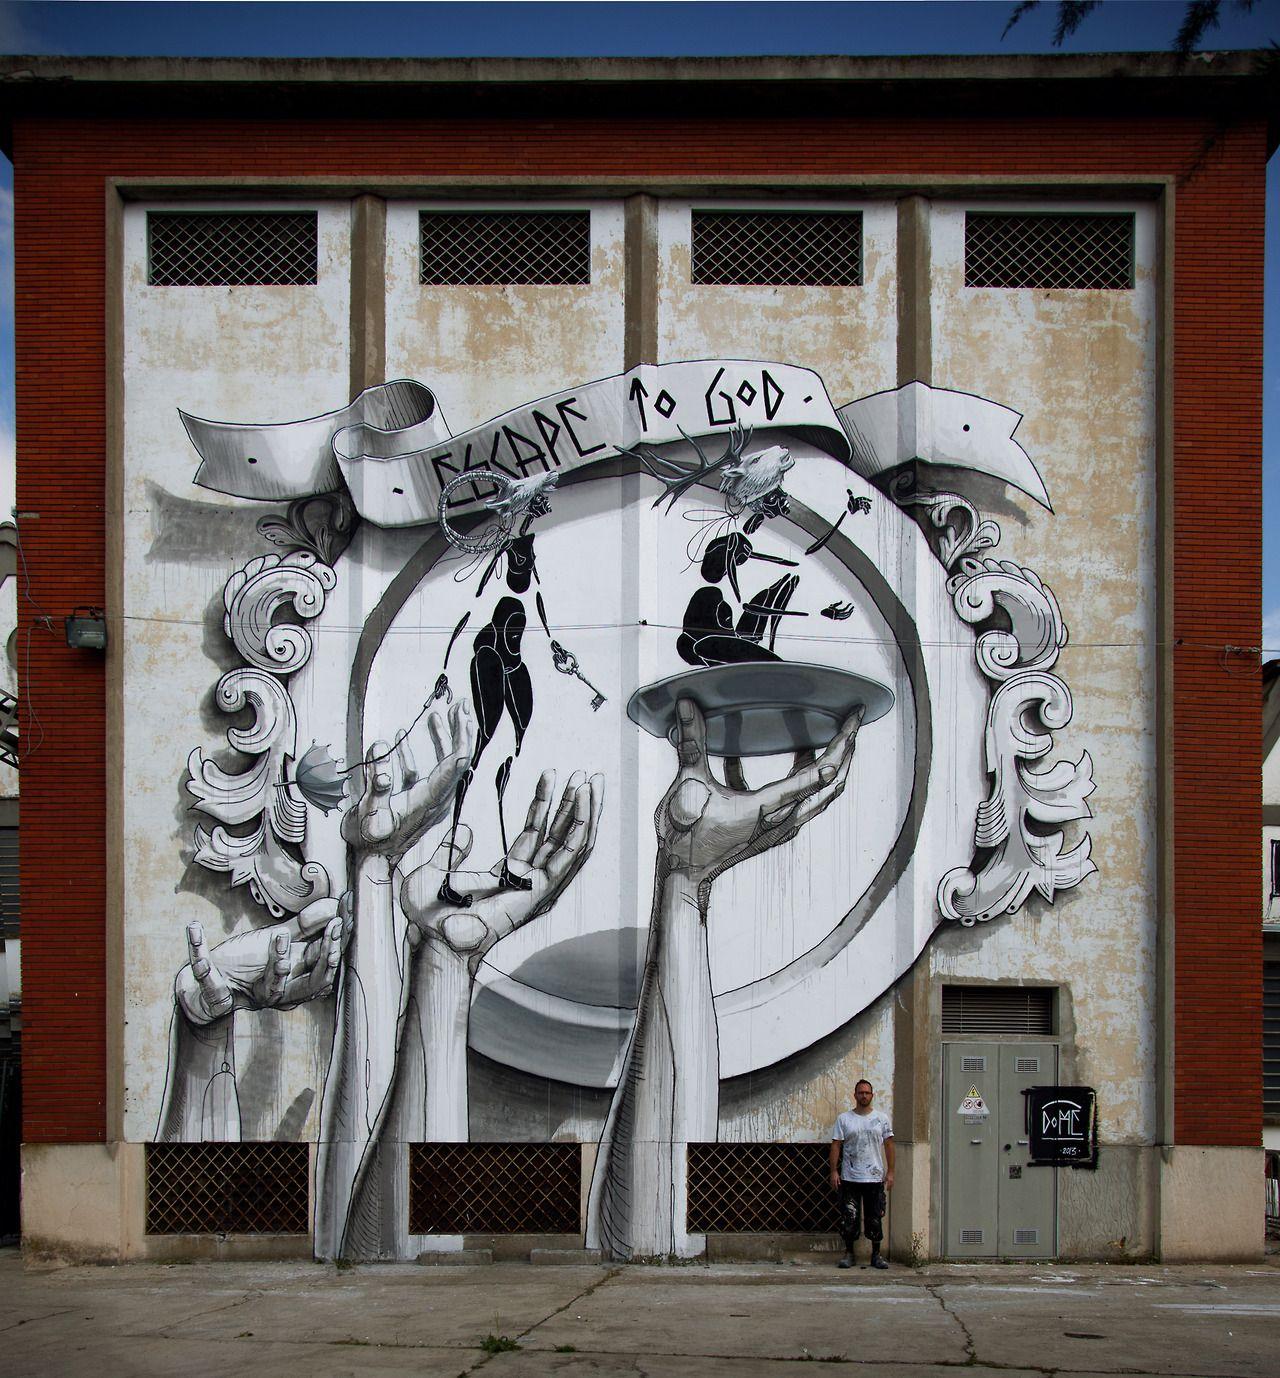 Artist : Dome. Place : Chieri, Italy. Tags : street Art, graffiti, urban culture.